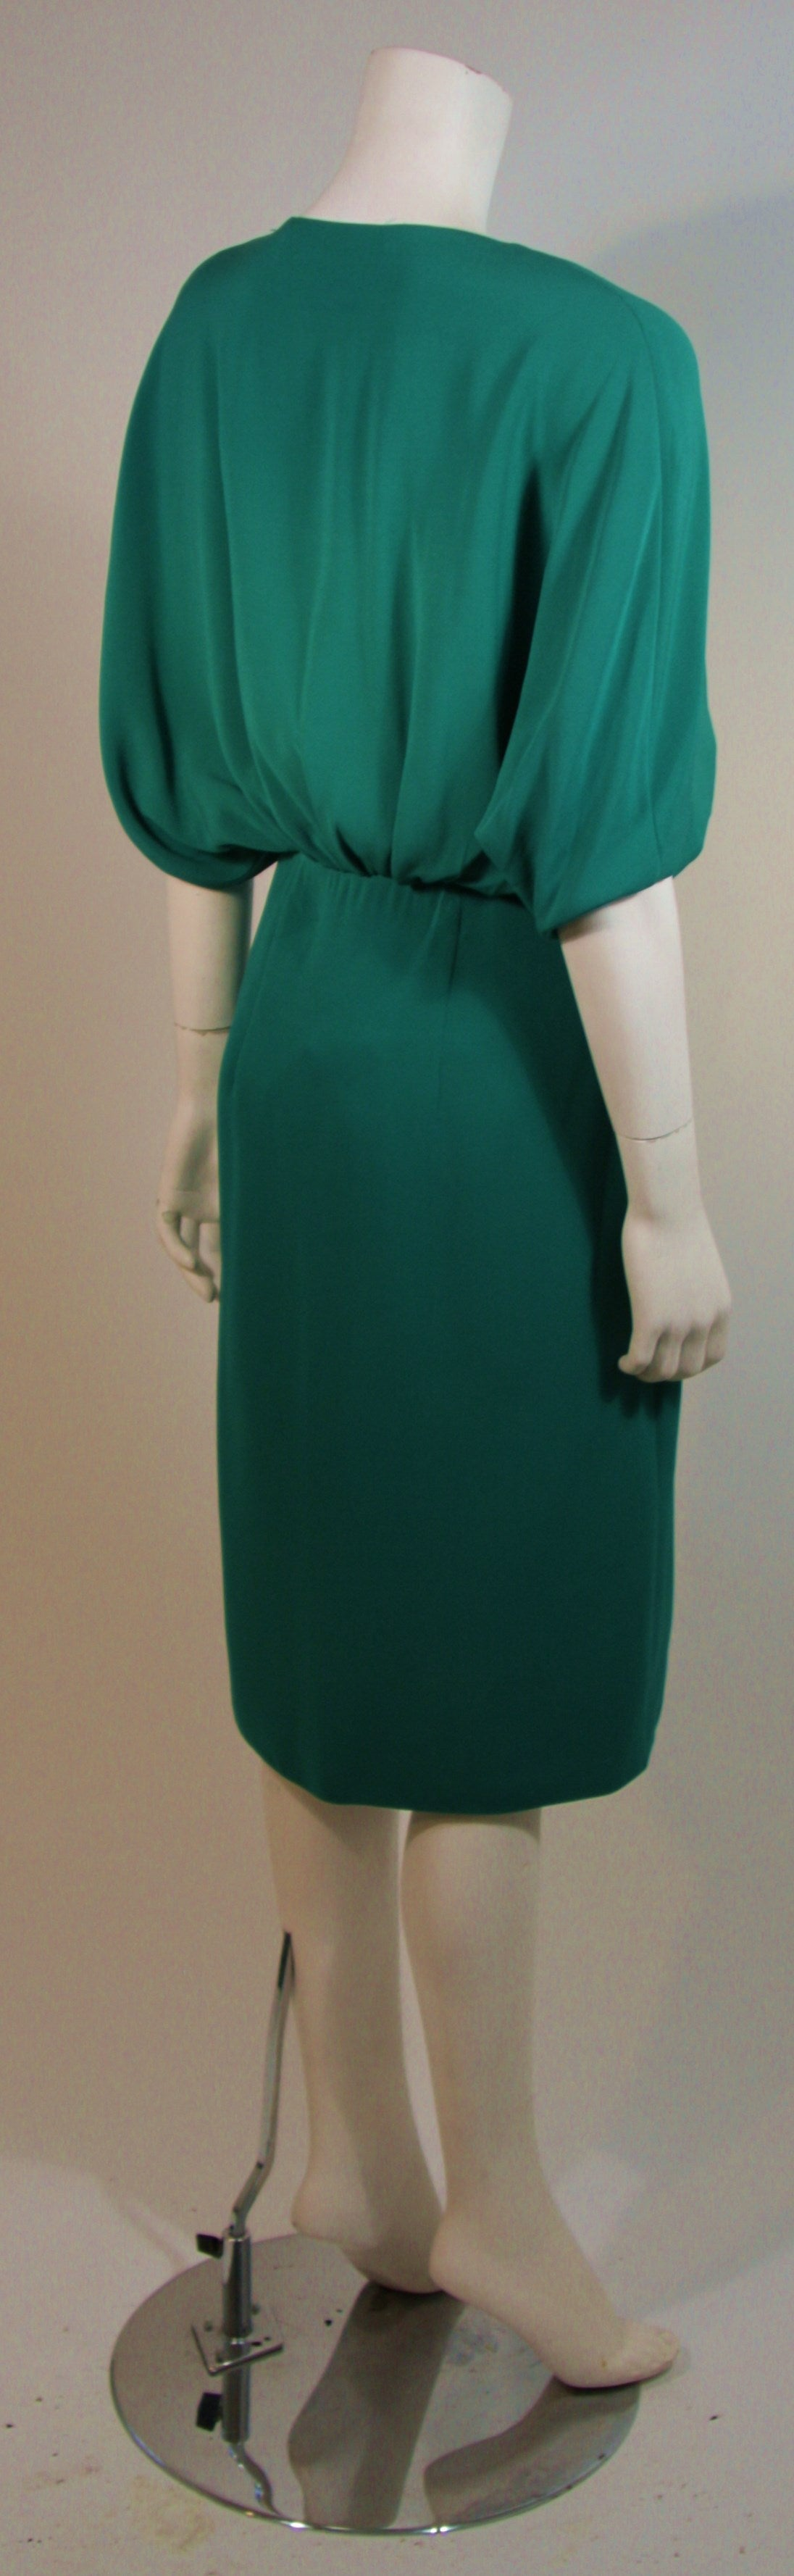 Women's Valentino Green Silk Cocktail Dress with Plunge Neckline Size 8 For Sale